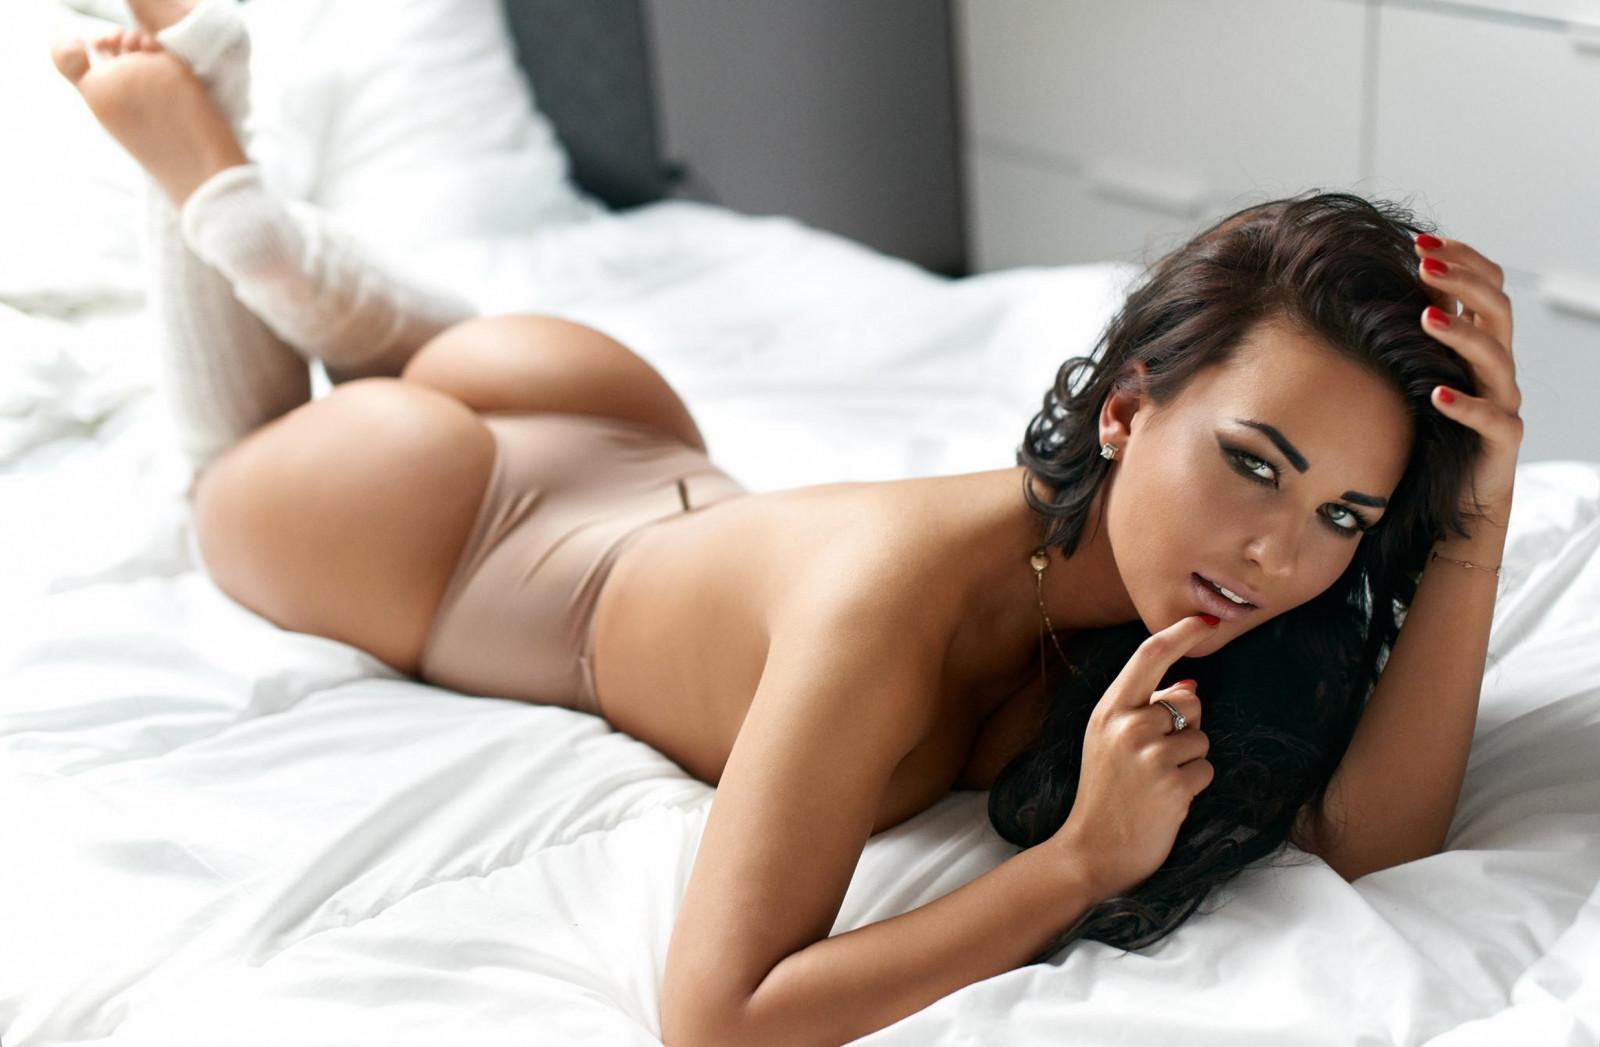 Sex super pourn girl housework video